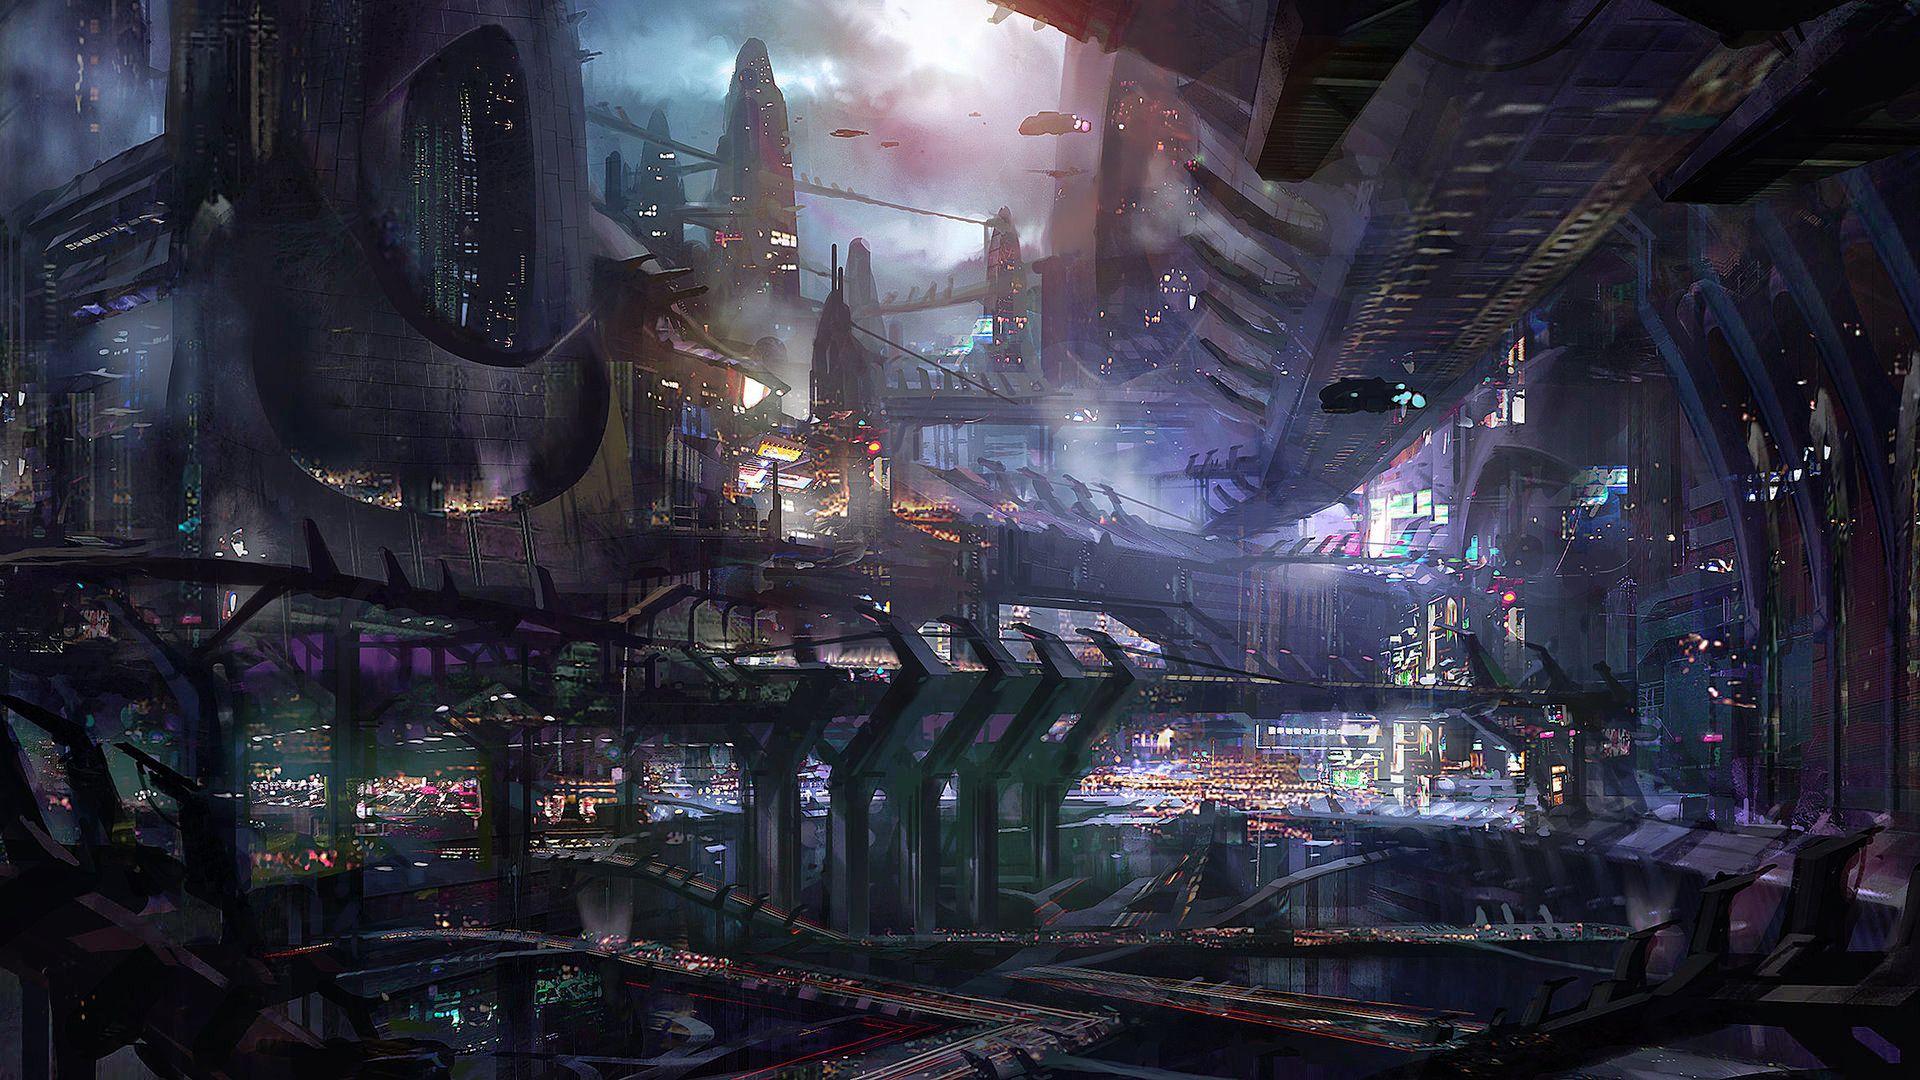 Sci-Fi Wallpaper HD